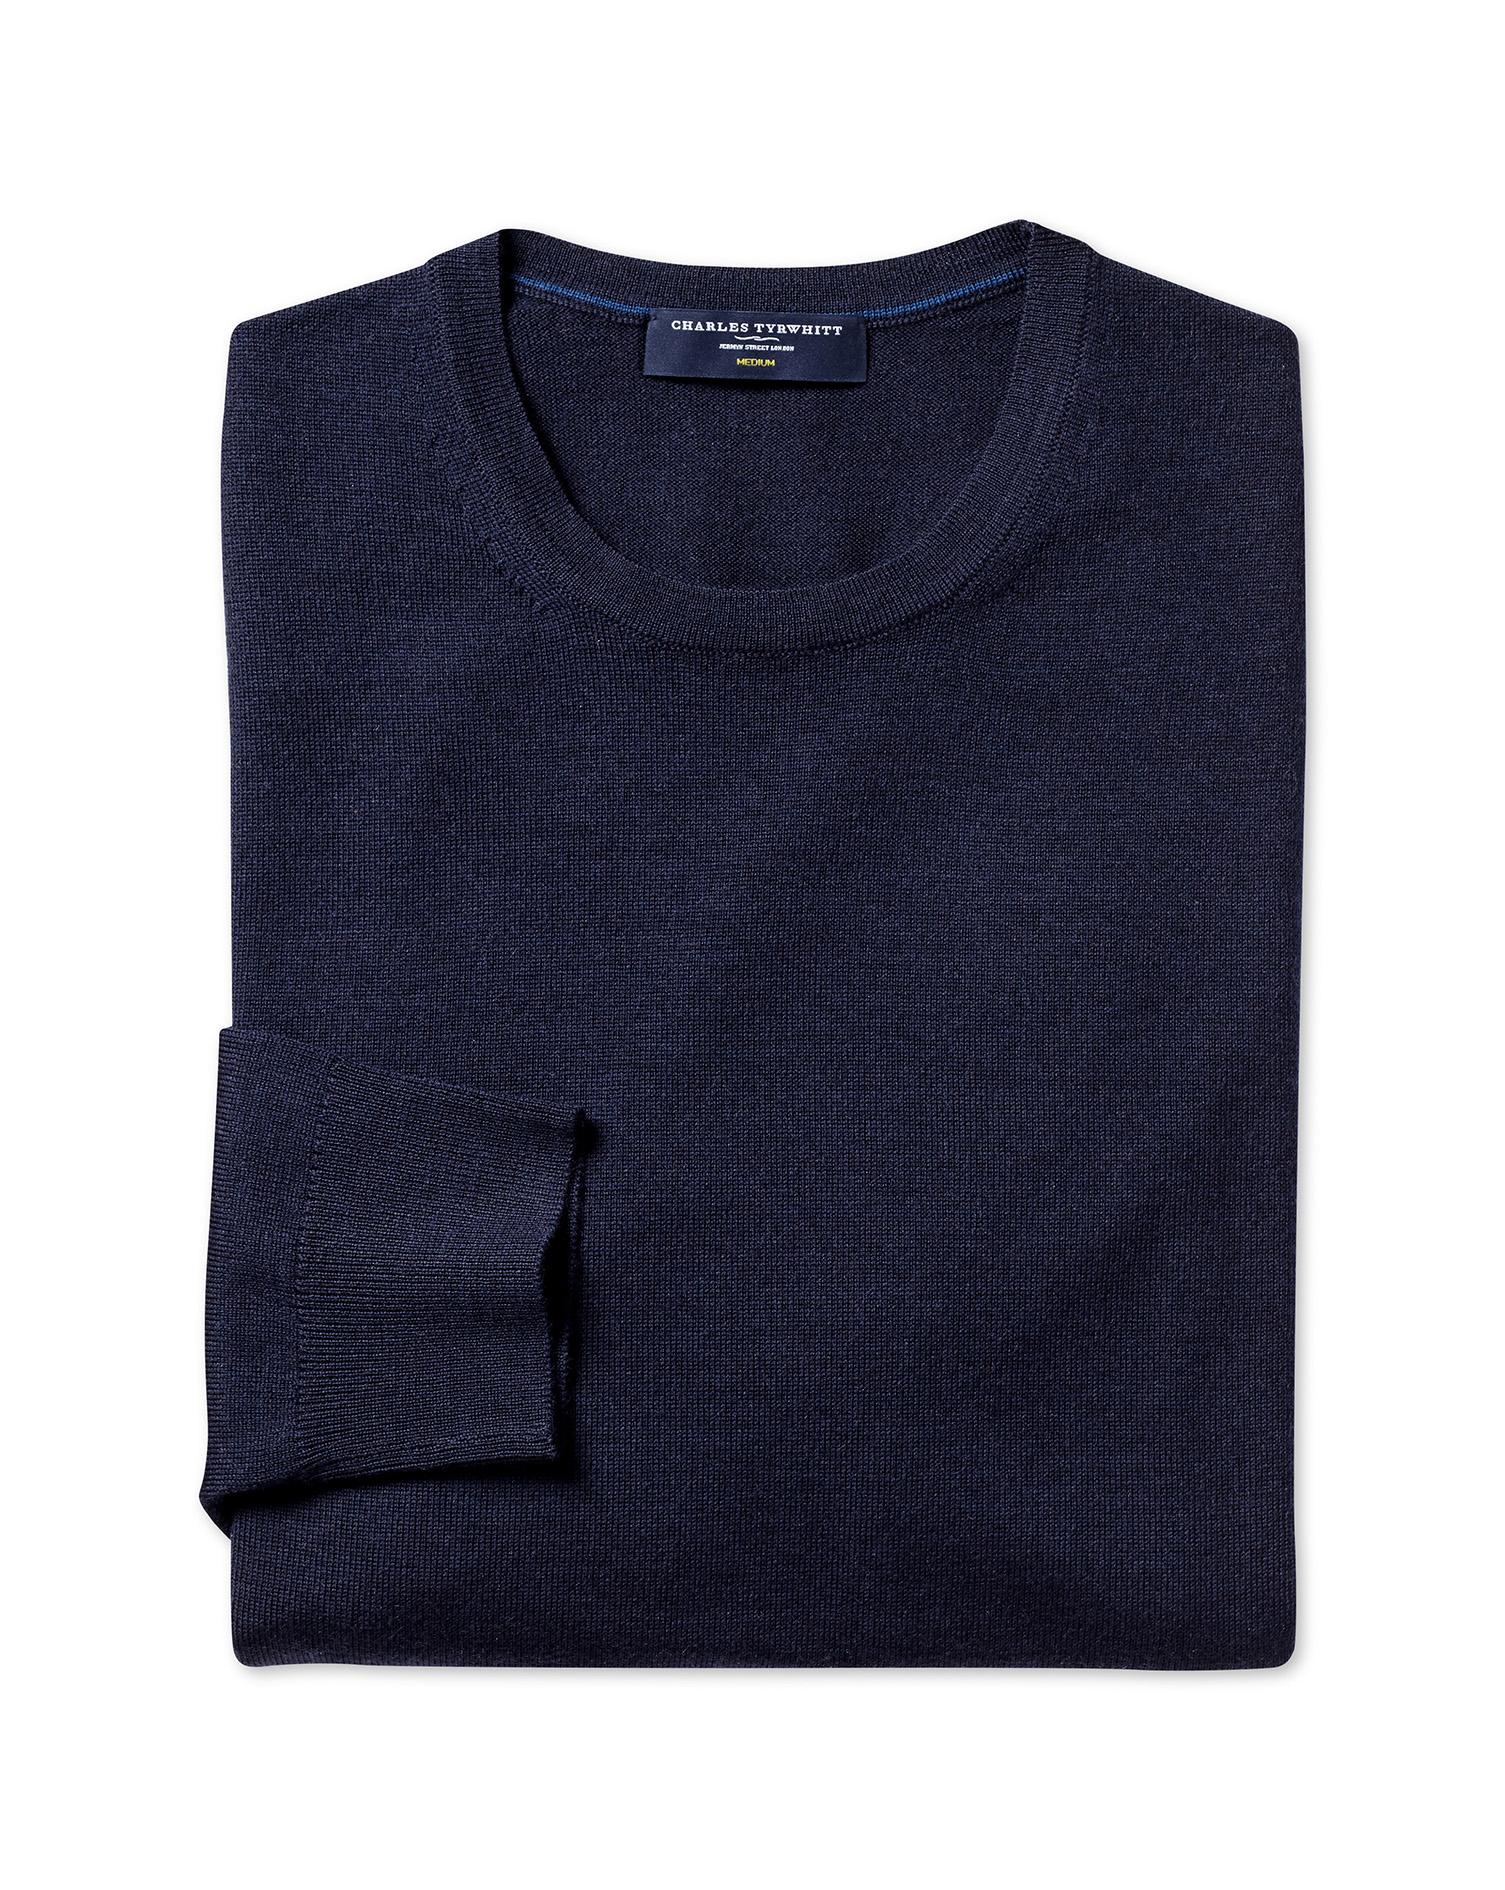 Navy Merino Wool Crew Neck Jumper Size XS by Charles Tyrwhitt